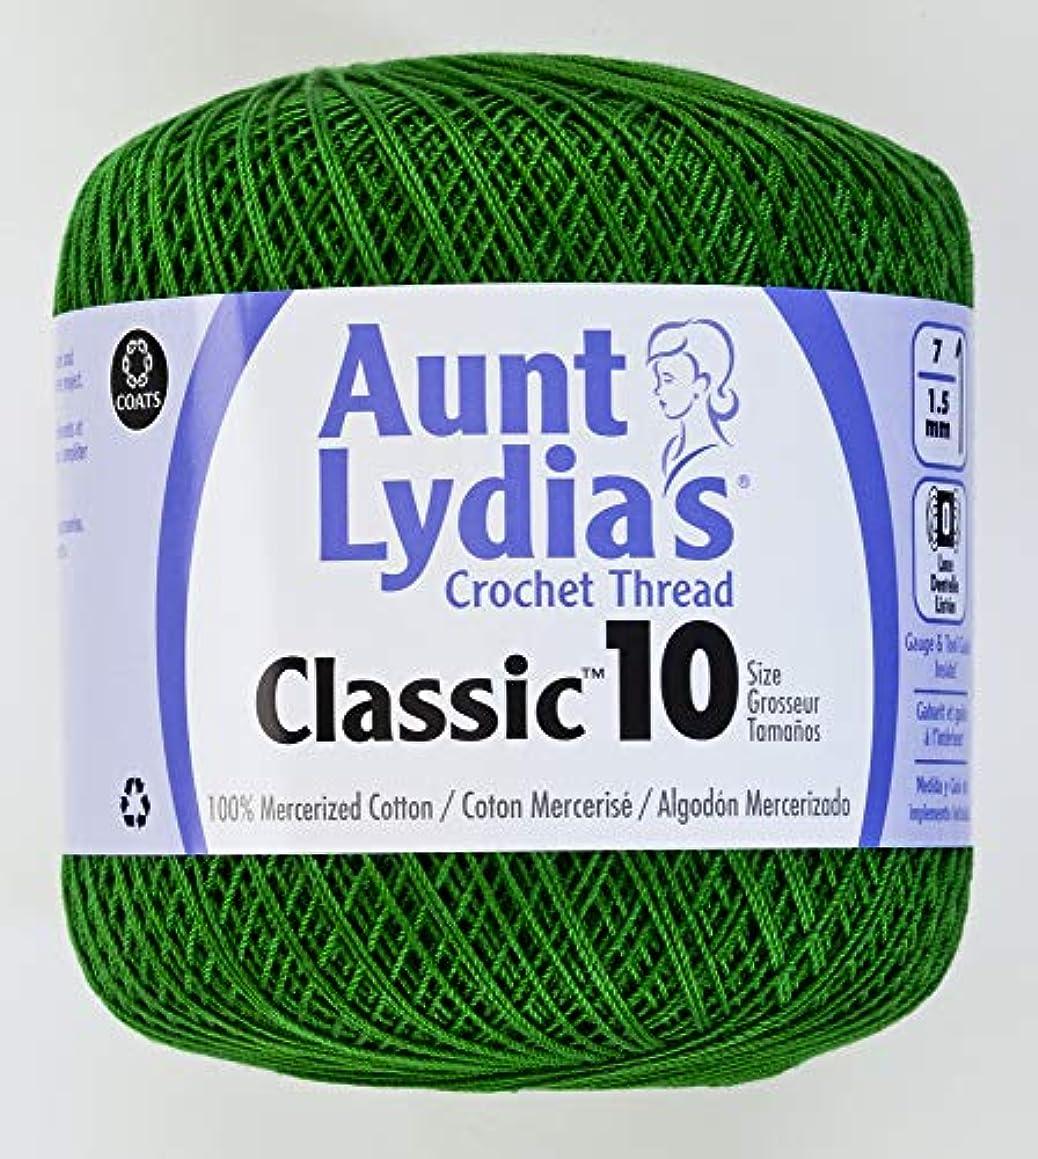 Coats Crochet Classic Crochet Thread, Myrtle Green